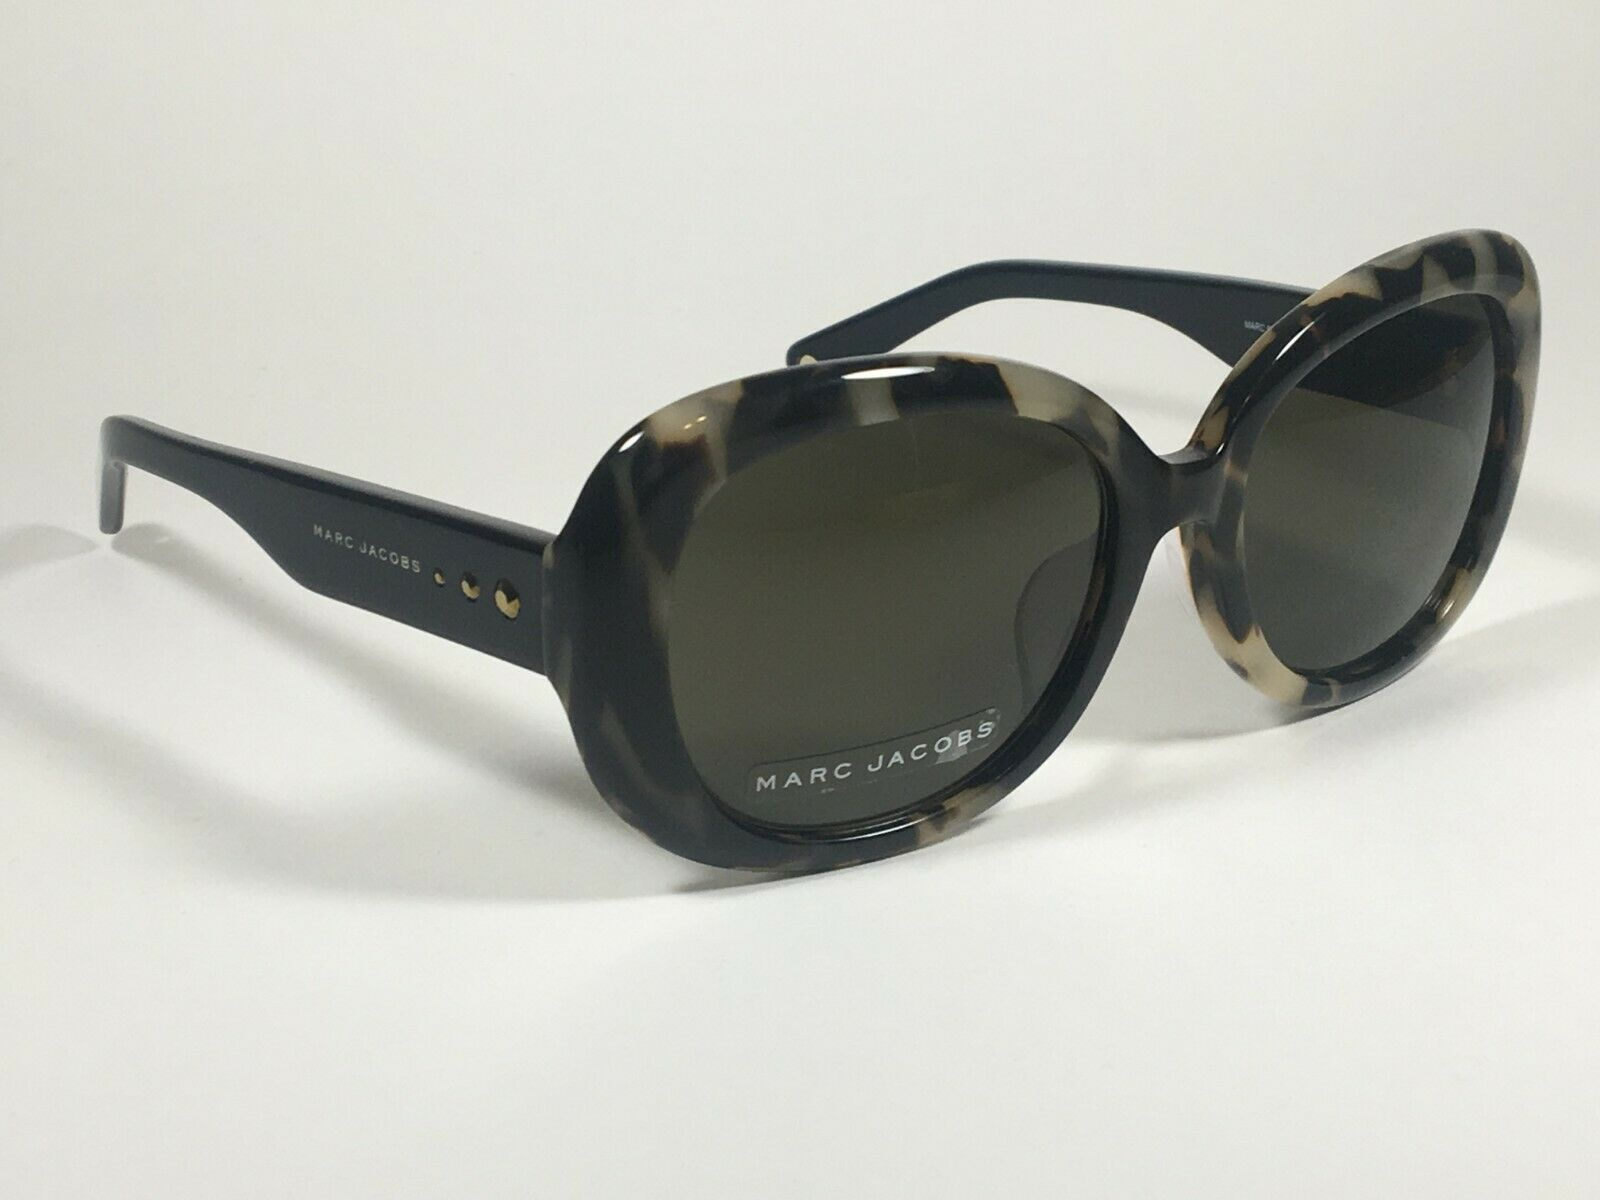 Authentic Marc Jacobs Oval MARC 97 Sunglasses Black Light Tortoise Gray Lens